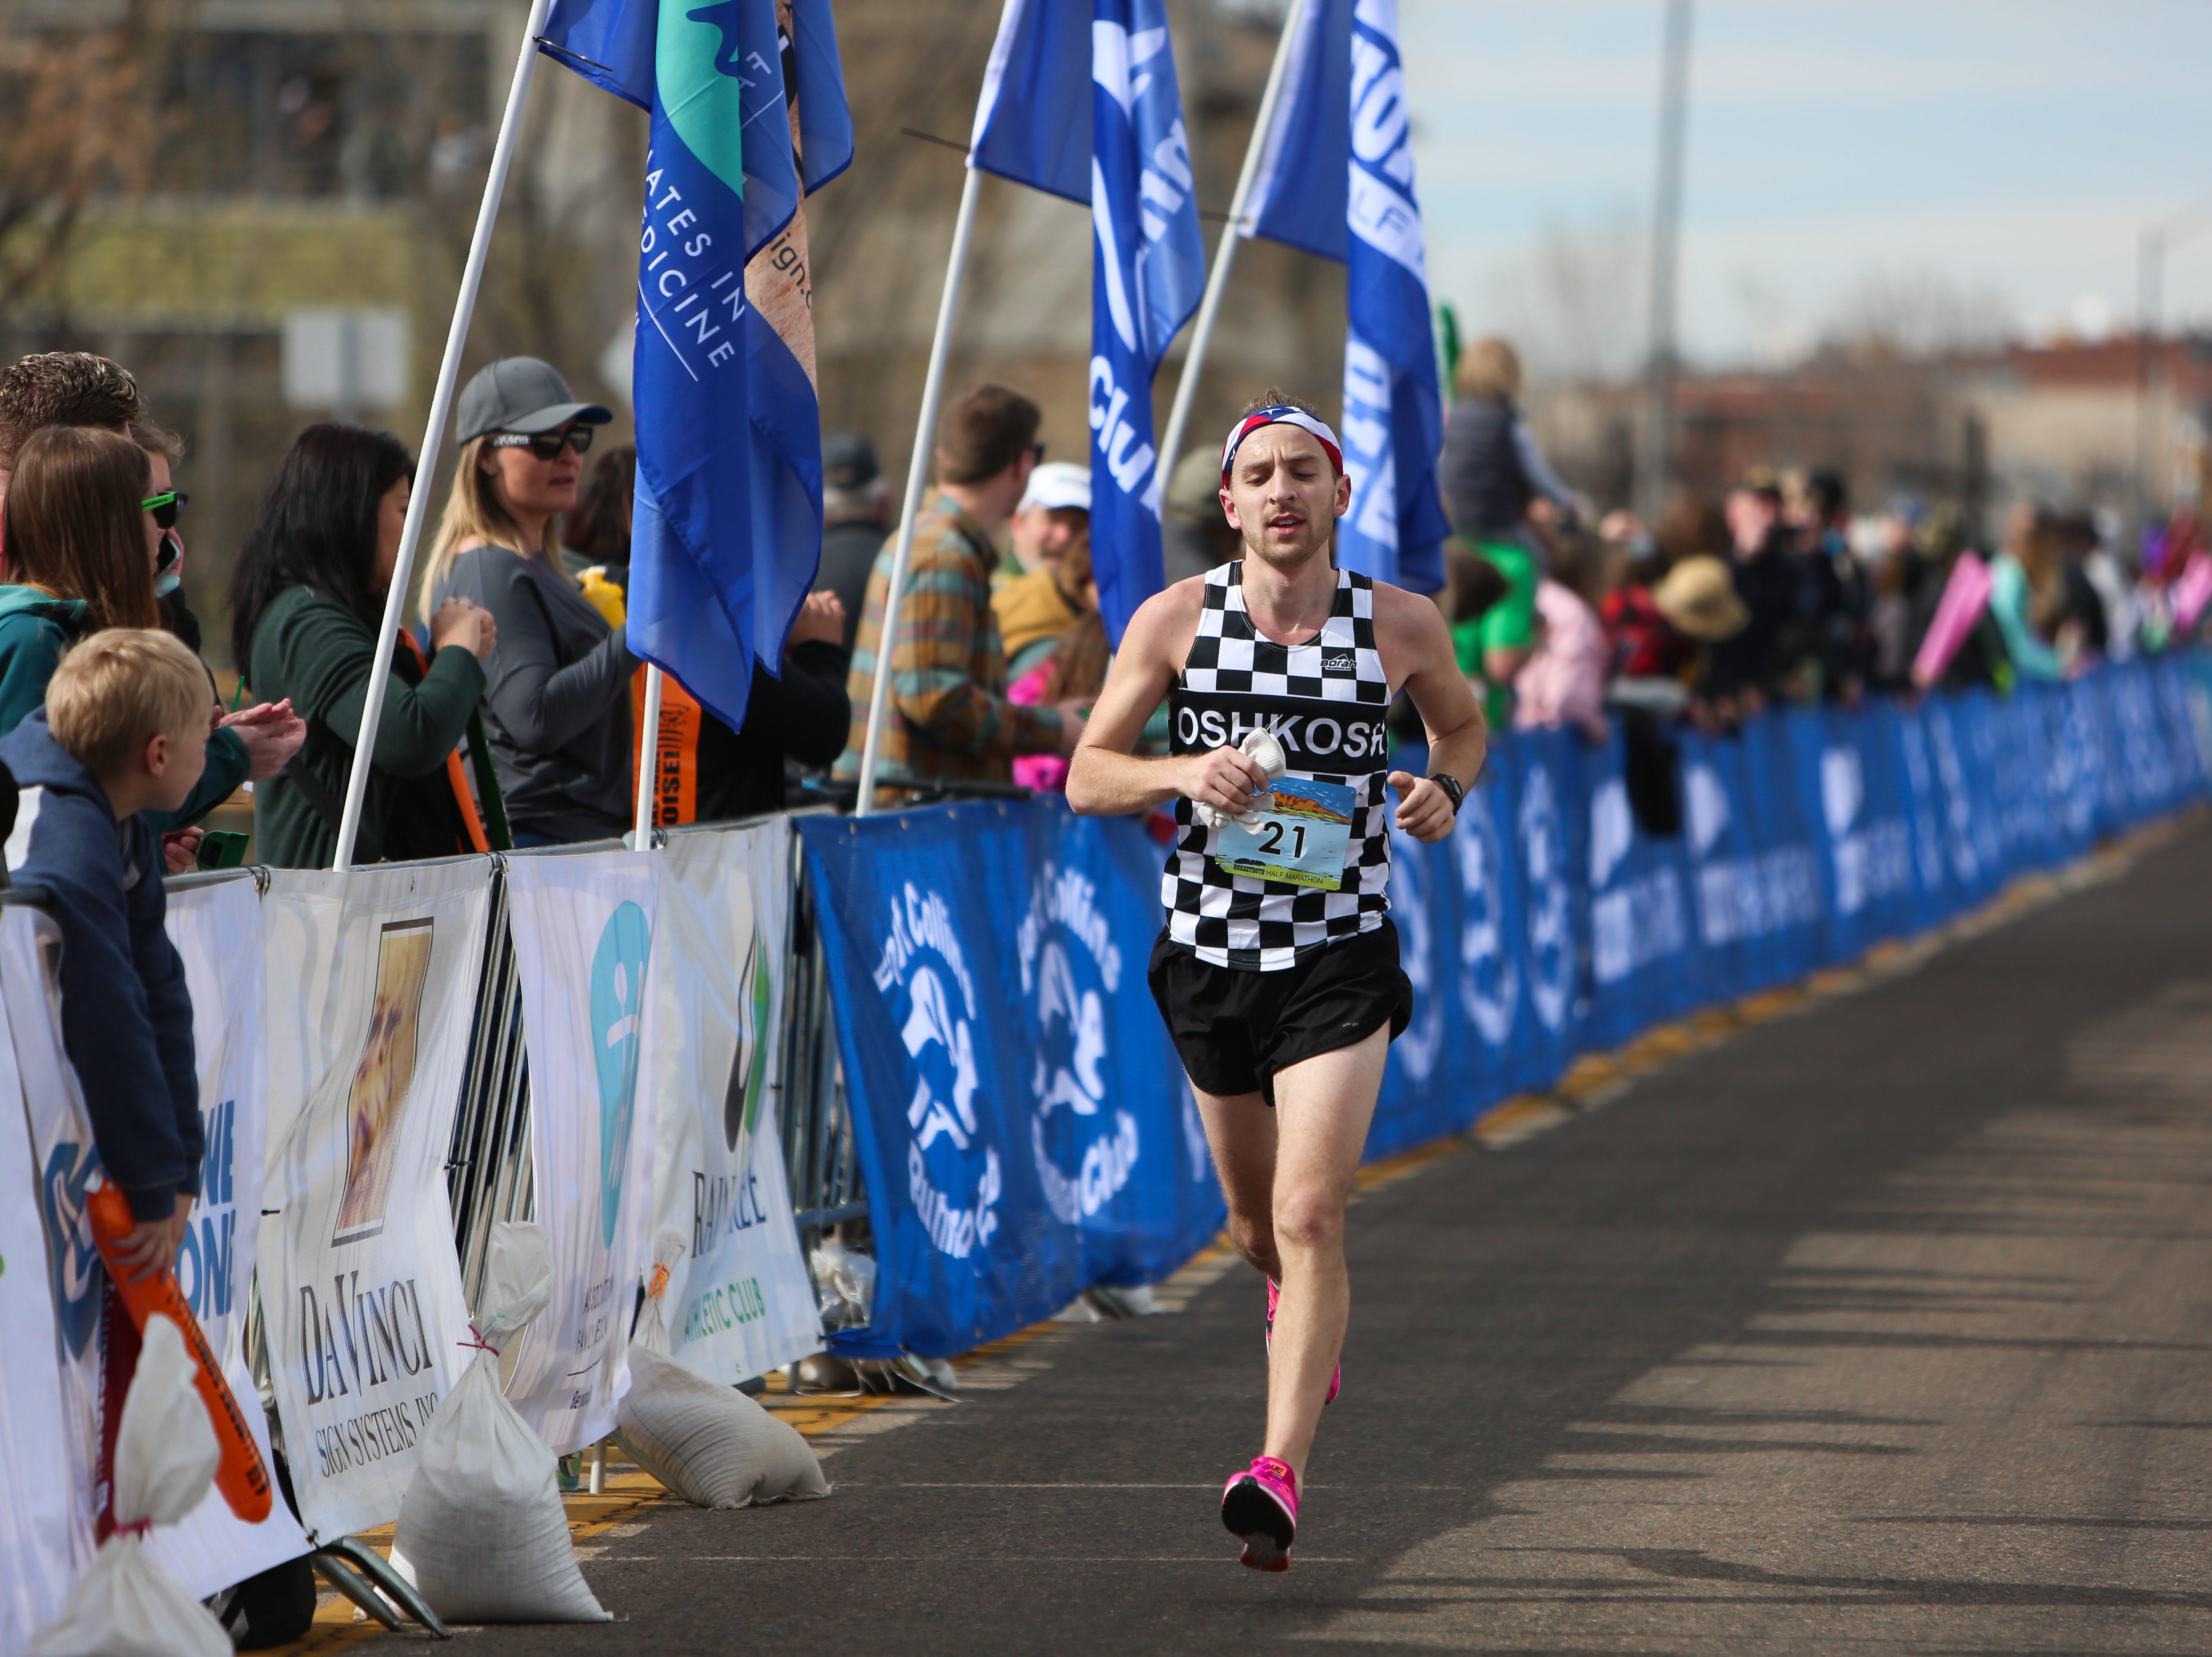 Derek Johnsrud completes the Horsetooth Half Marathon on April 14.